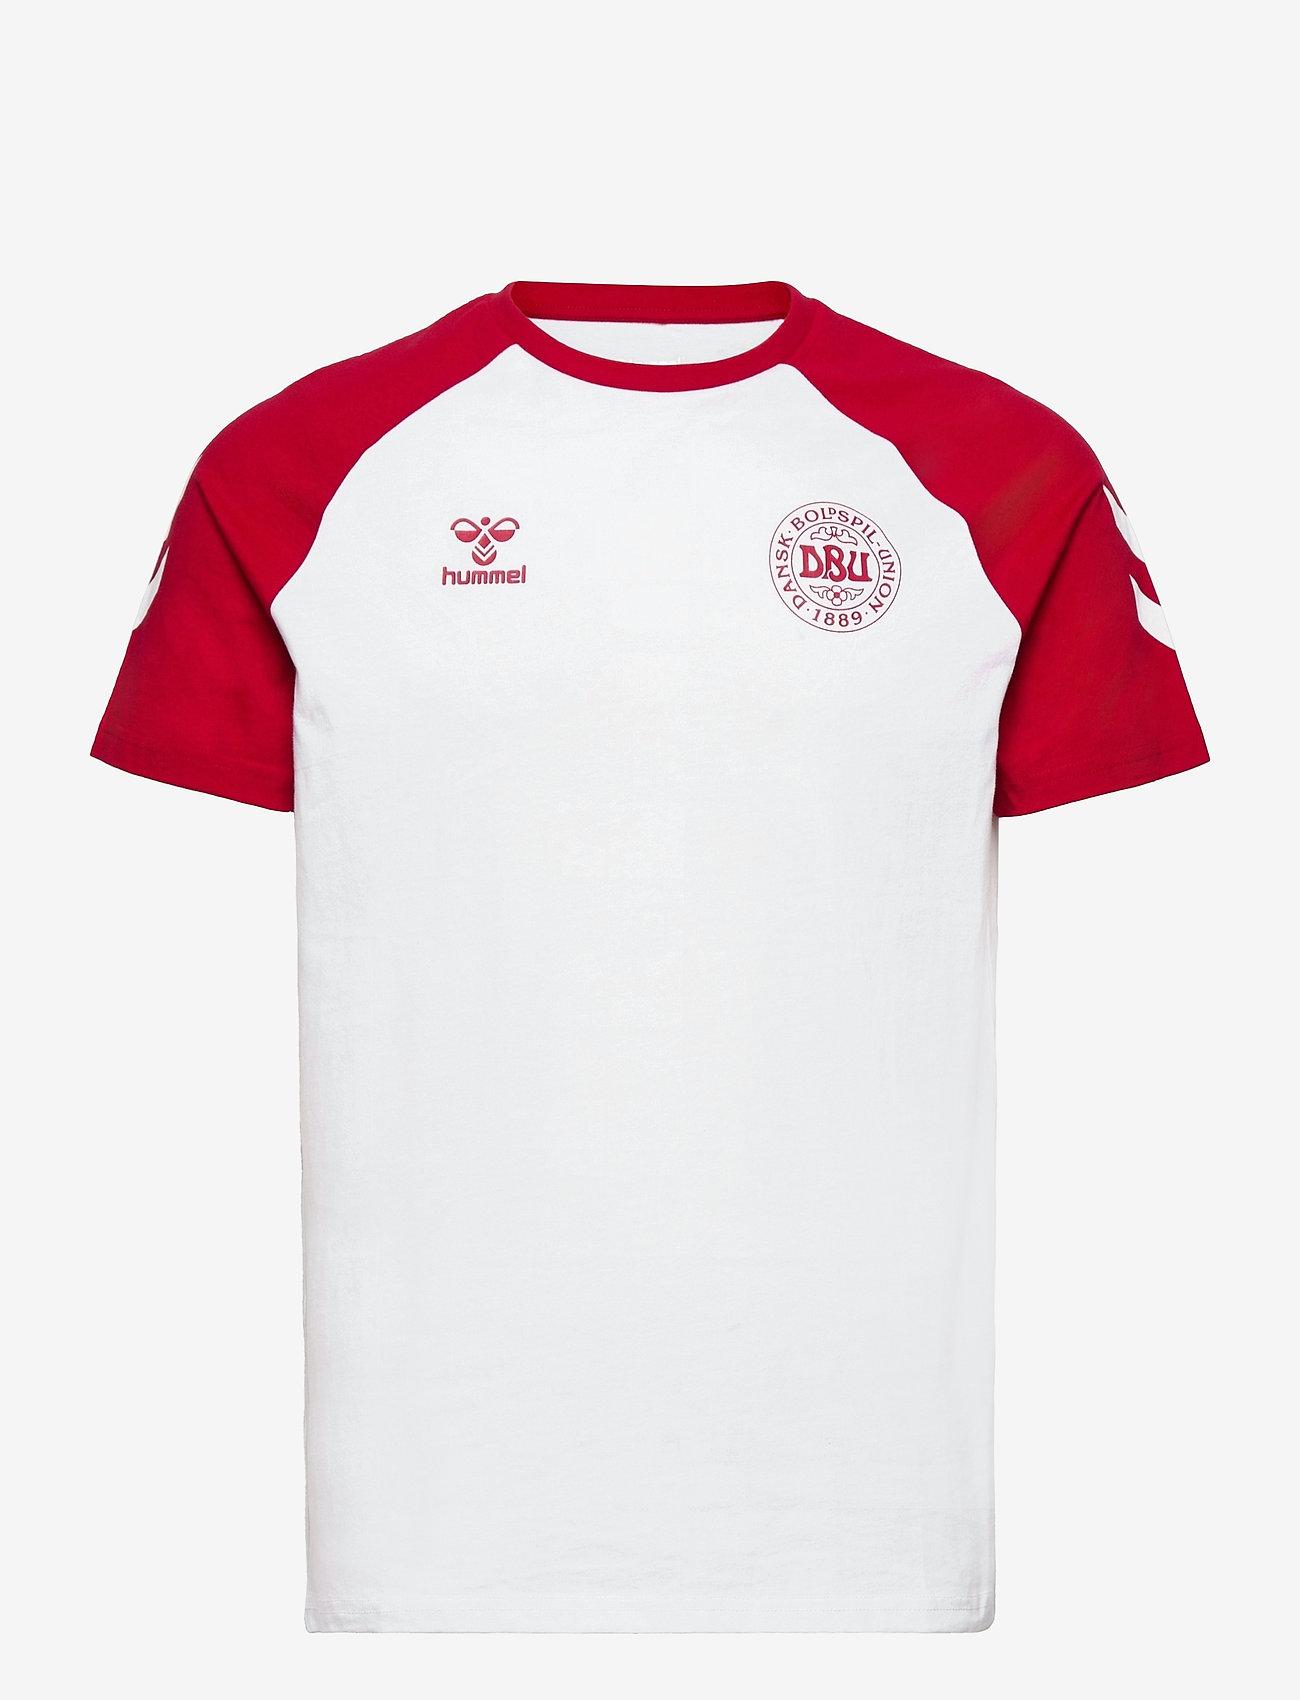 Hummel - DBU FAN 2020 COT. TEE S/S - football shirts - white - 0